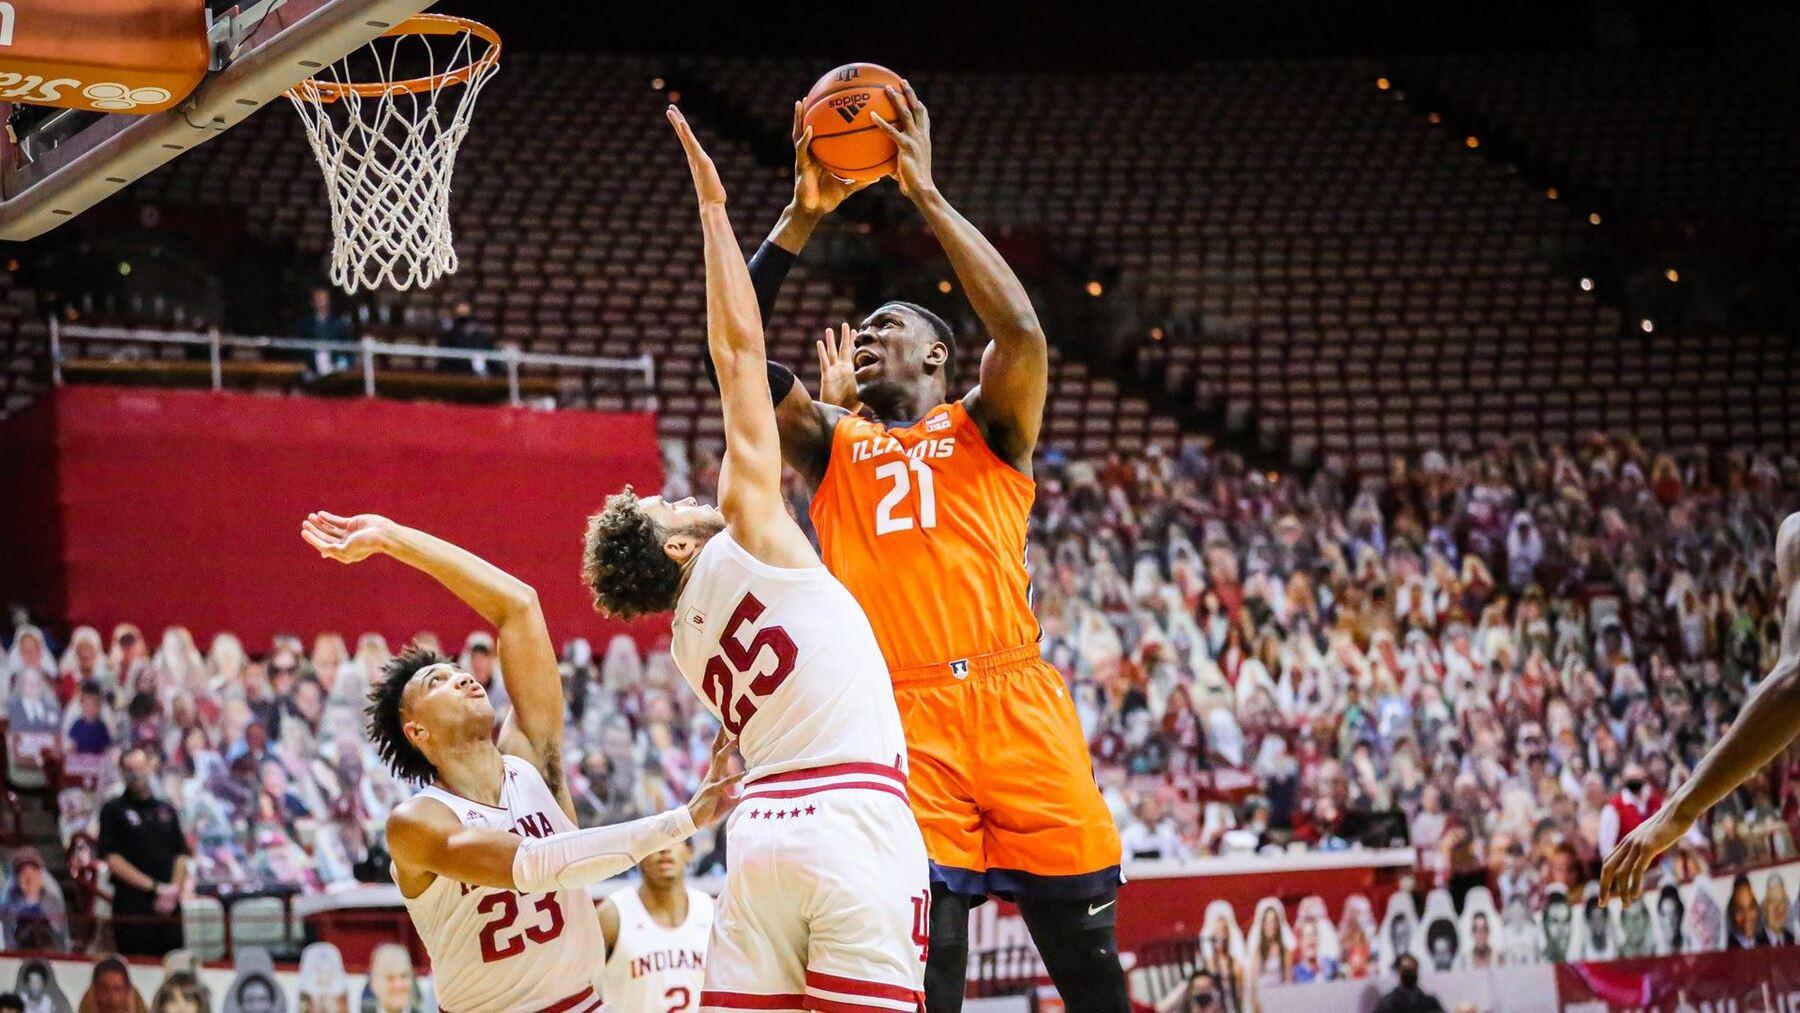 Kofi Cockburn elevated under the basket against Indiana defenders